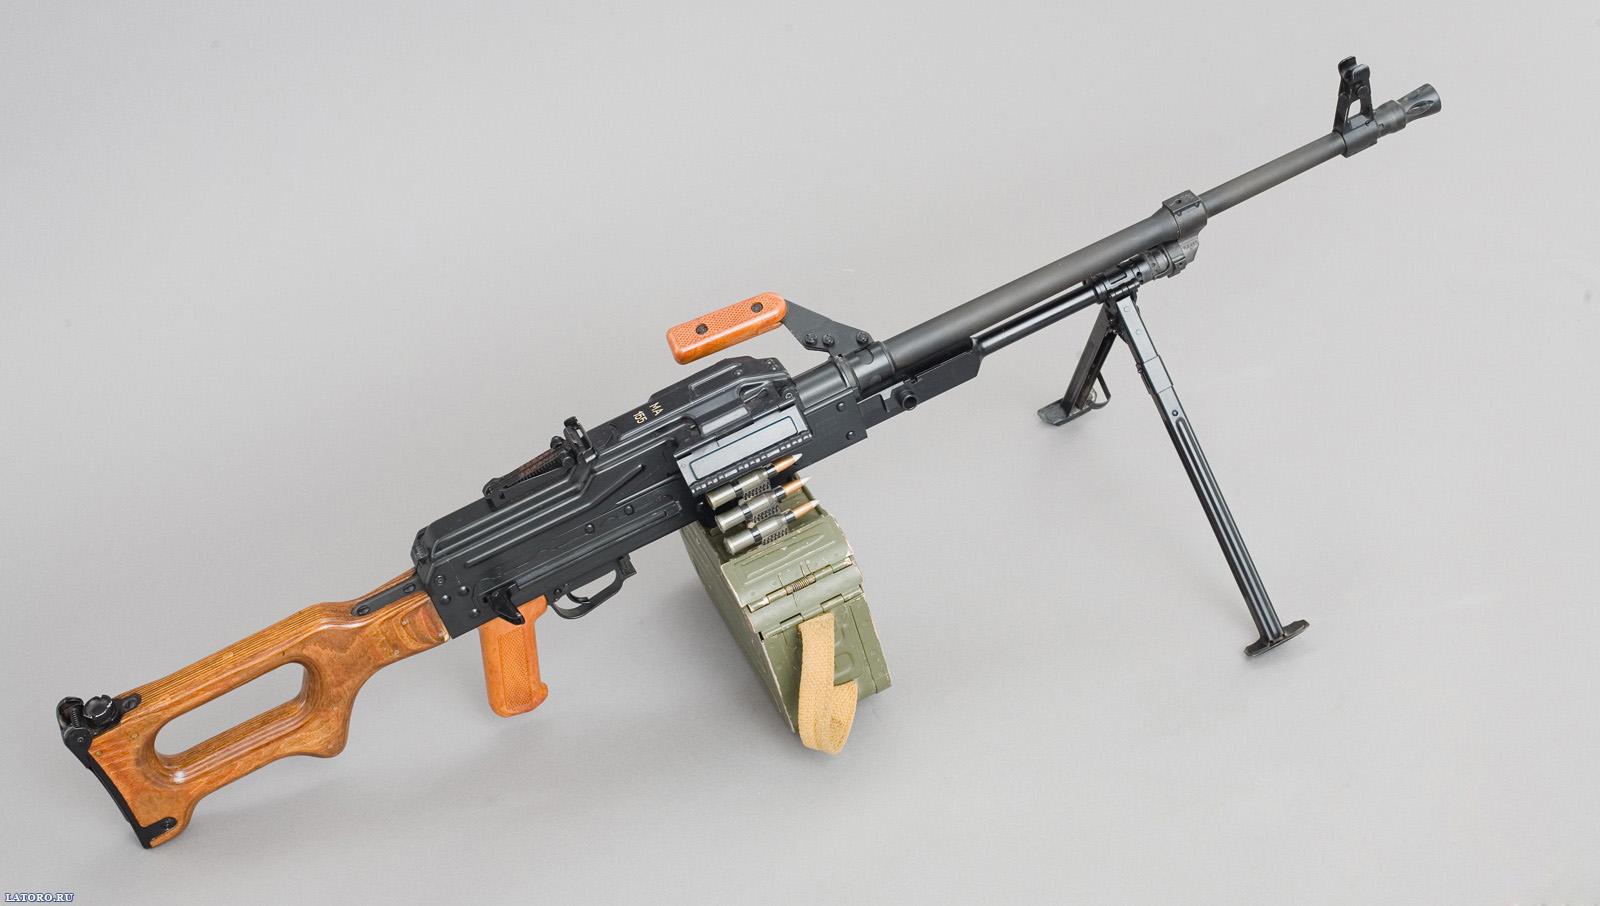 http://4.bp.blogspot.com/-UfGIak7PX_A/URJnsf1sTFI/AAAAAAAAAFg/wG98aOL44eA/s1600/15937-desktop-wallpapers-pkm-kalashnikov-machine-gun.jpg